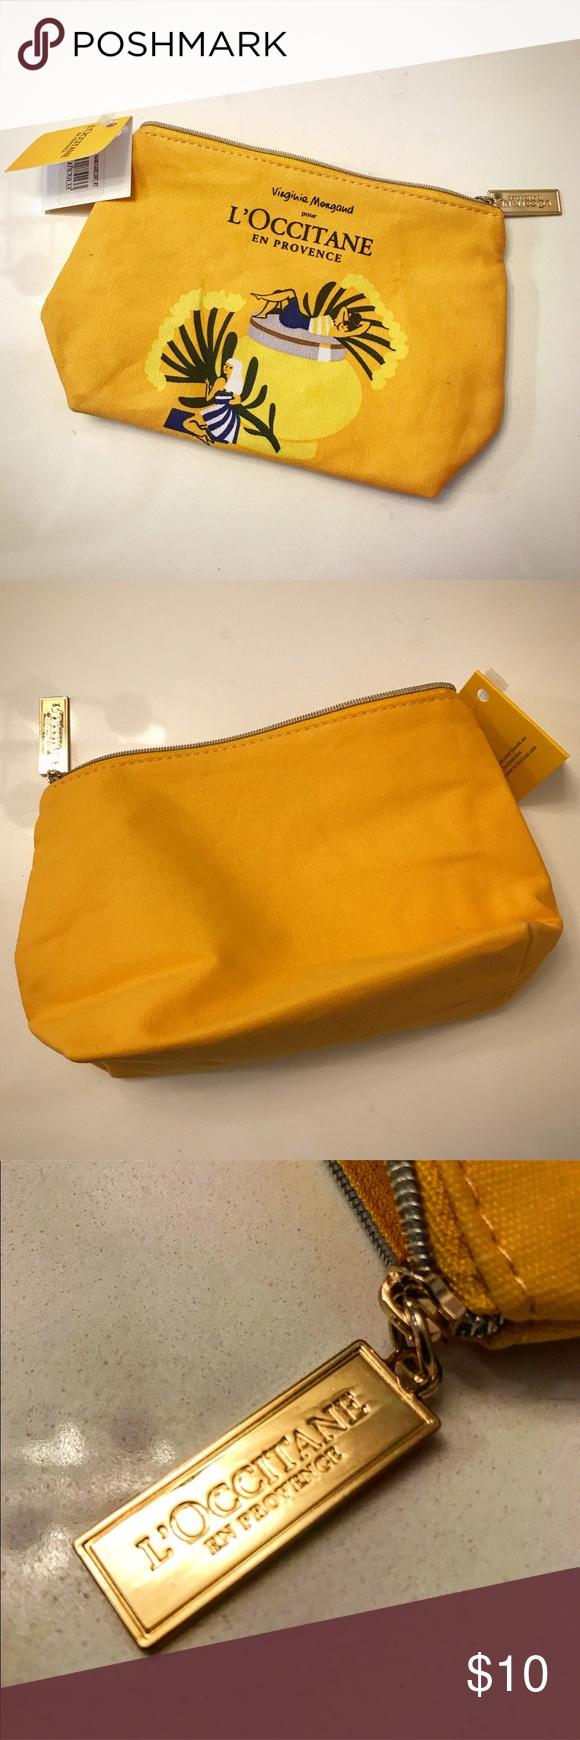 NWT L'Occitane Canvas Cosmetics Bag NWT Canvas cosmetic